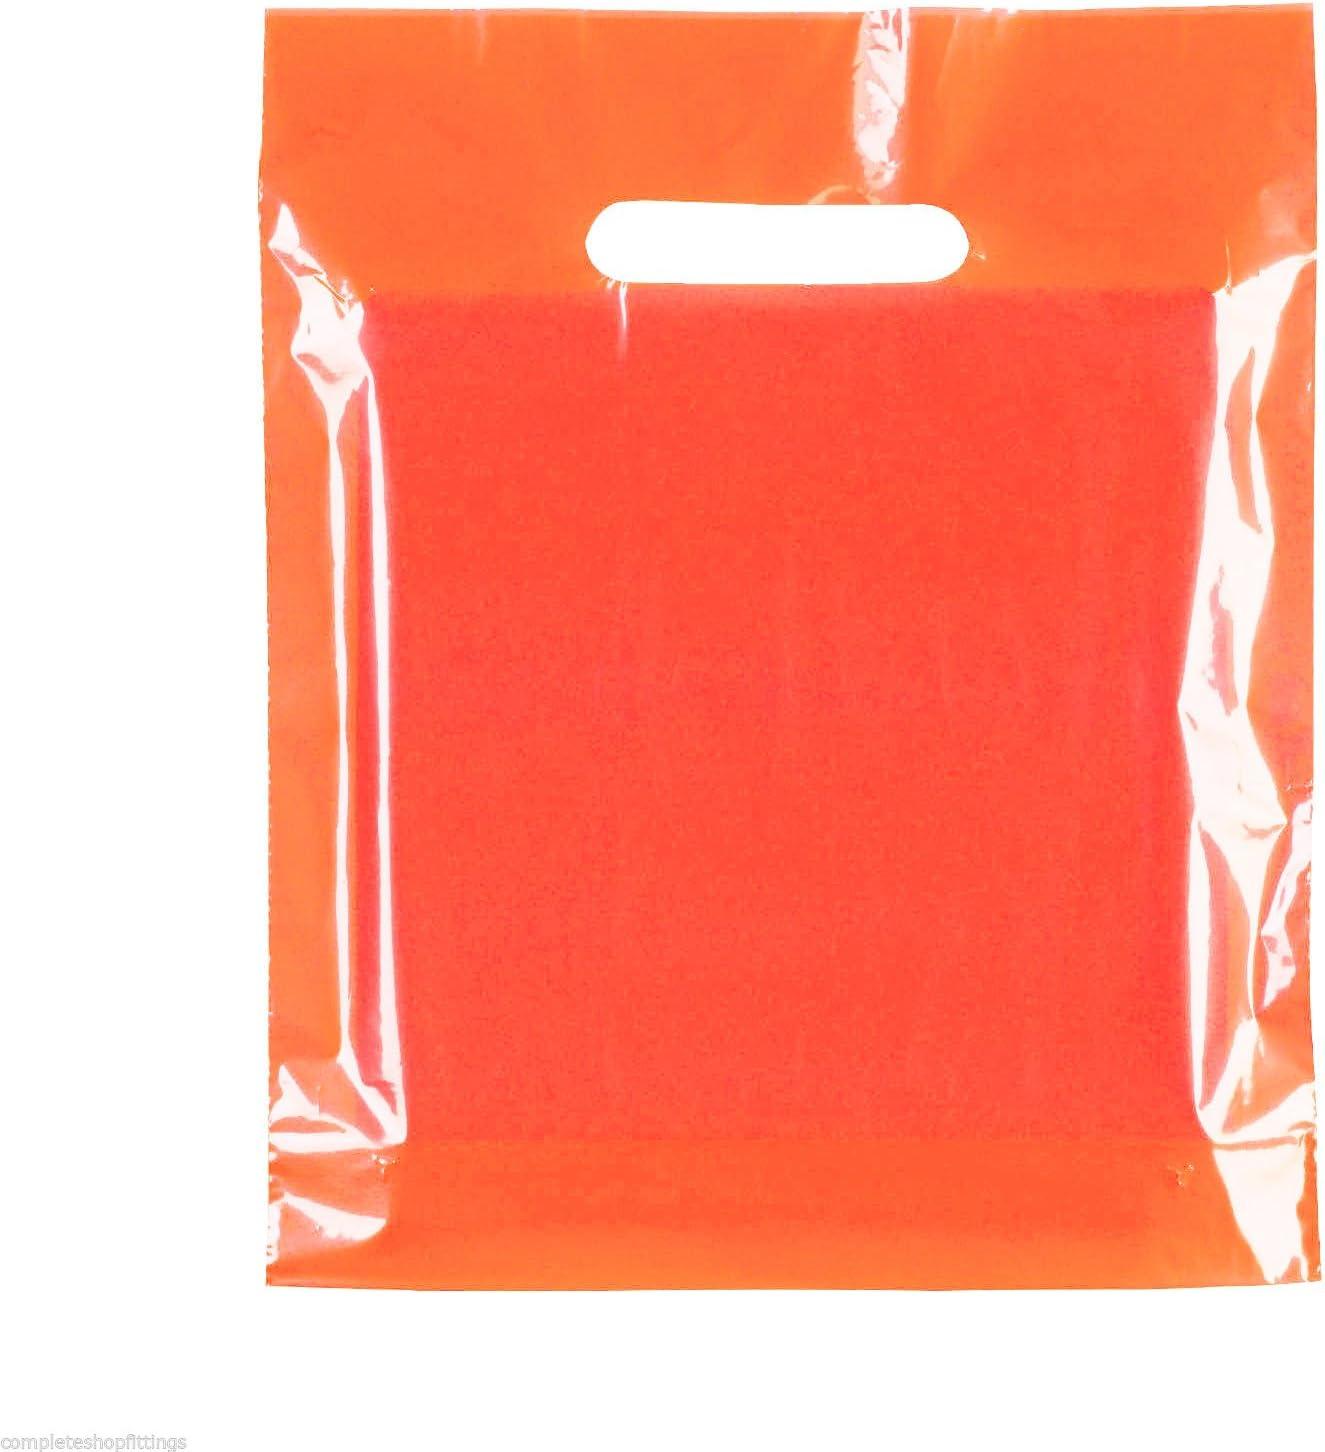 Complete Retail Source ltd 100 Bolsas de plástico con asa troquelada para Compras, 15 x 18 Pulgadas + 3 Pulgadas (Naranja Rojizo (50 micras), 15 x 18 Pulgadas + 3 (39 x 45 cm)